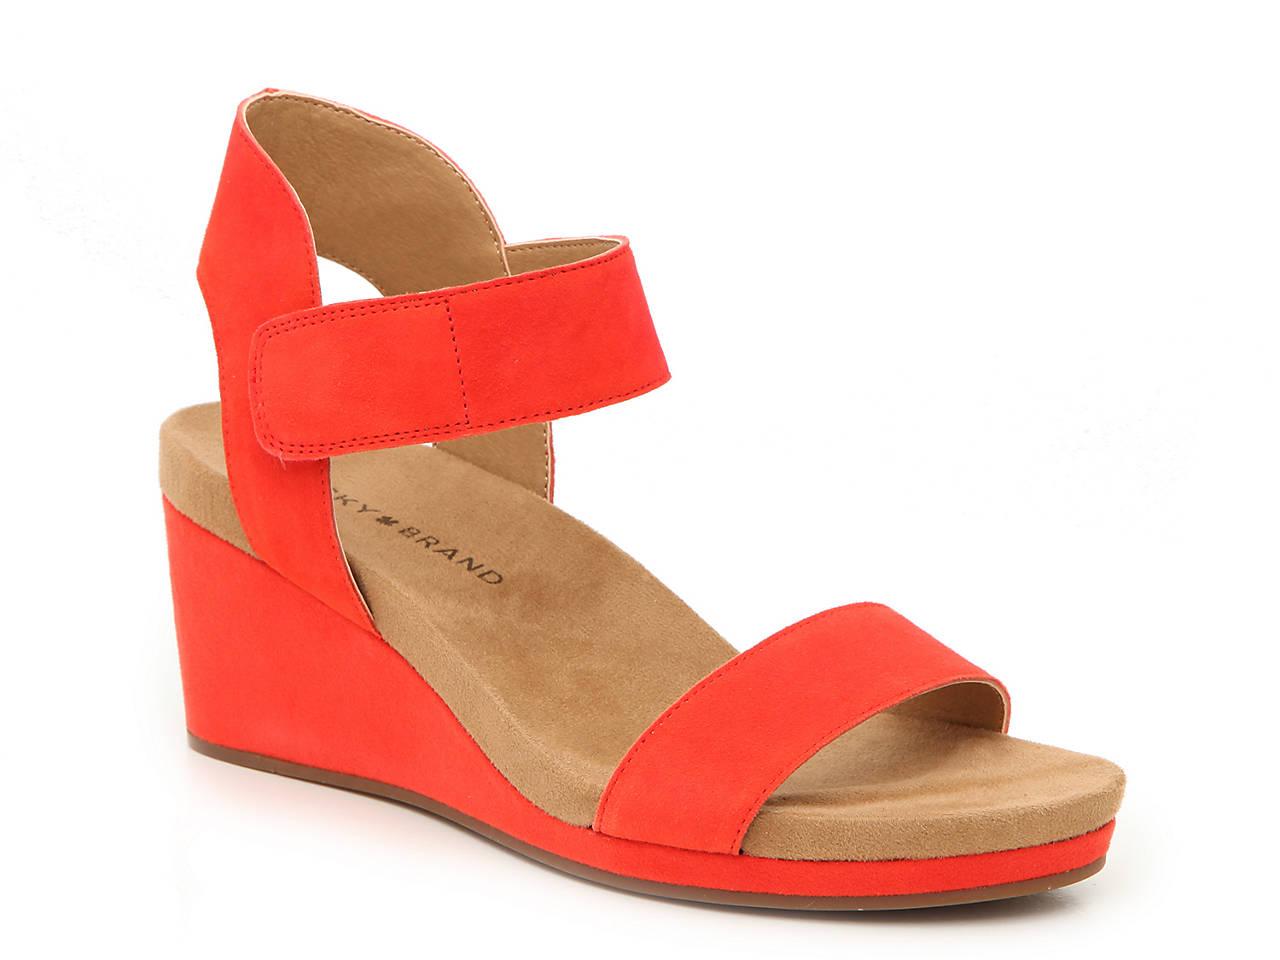 749a4c20b Lucky Brand Kamila Wedge Sandal Women's Shoes | DSW